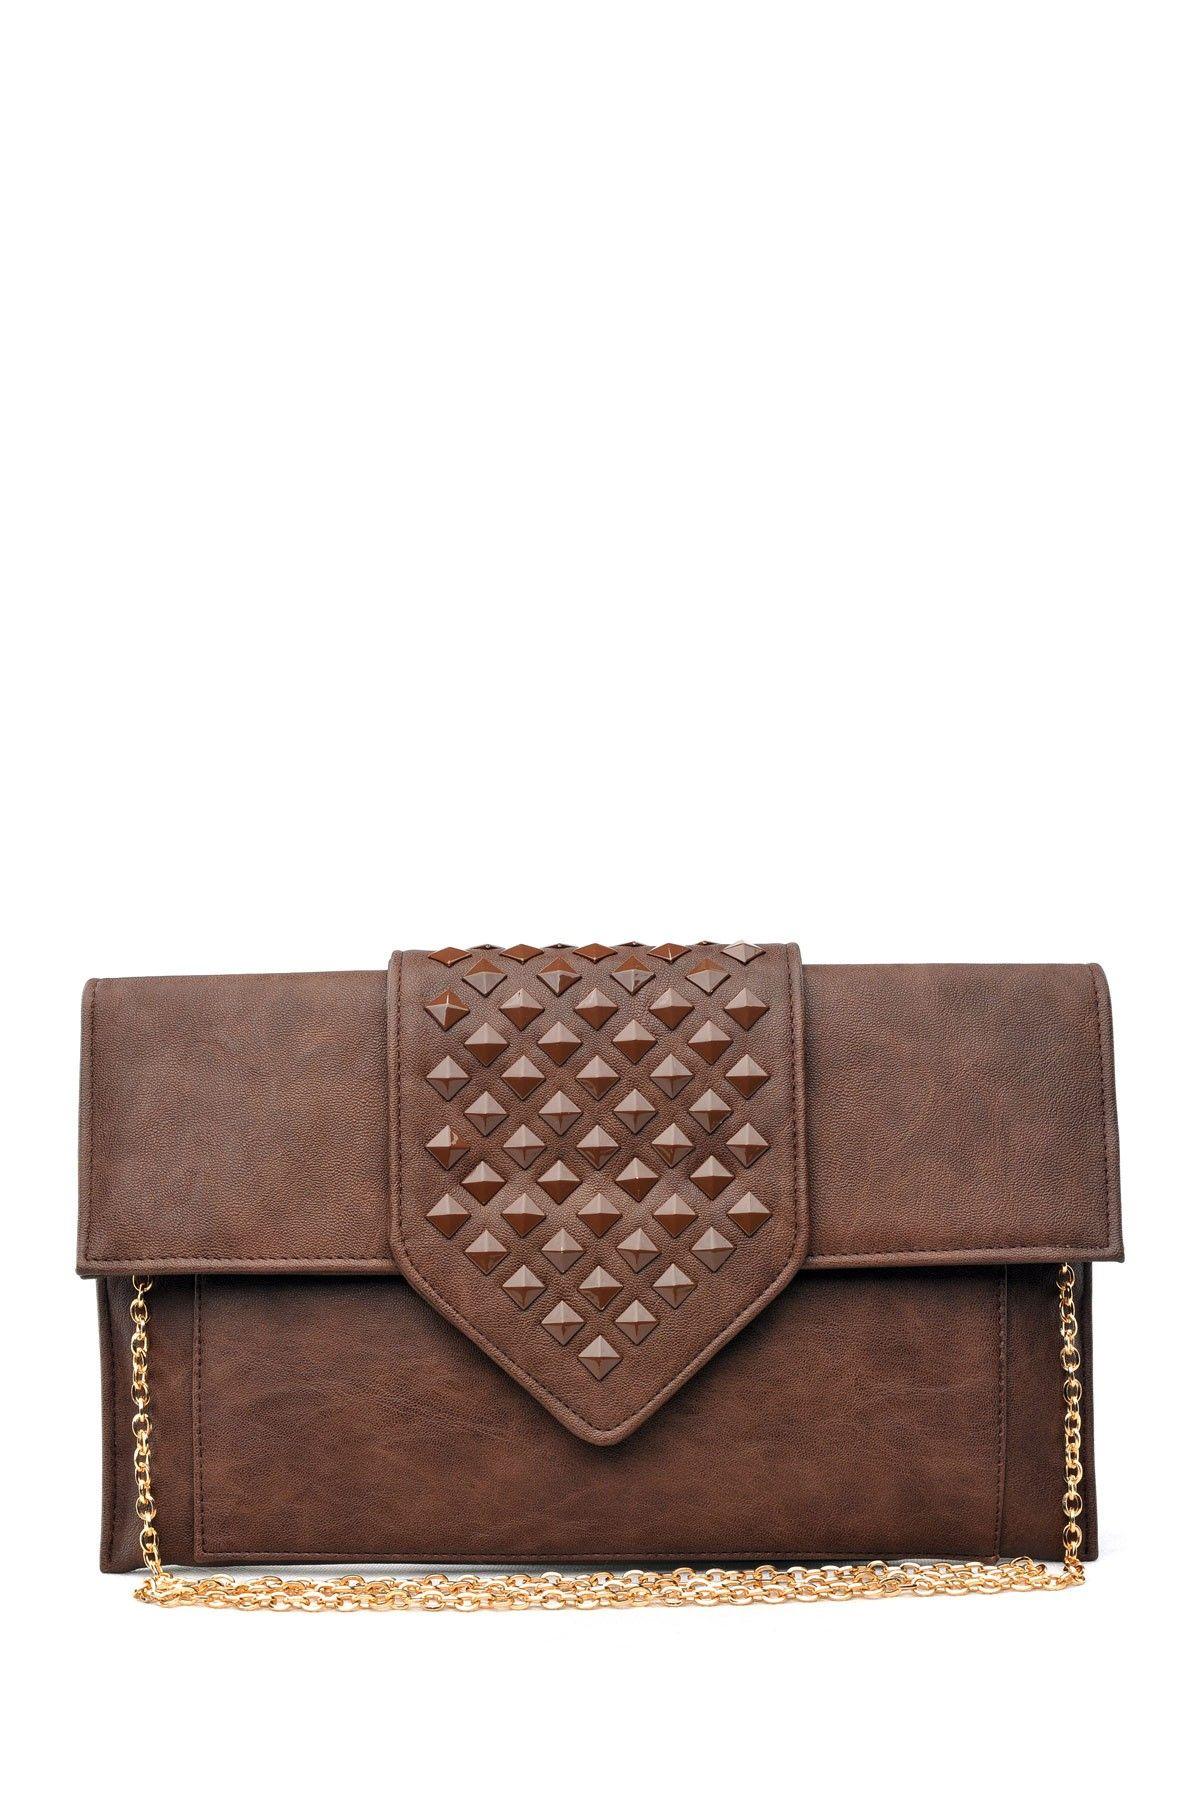 Maddox Convertible Clutch | Bags, handbags, purses, etc